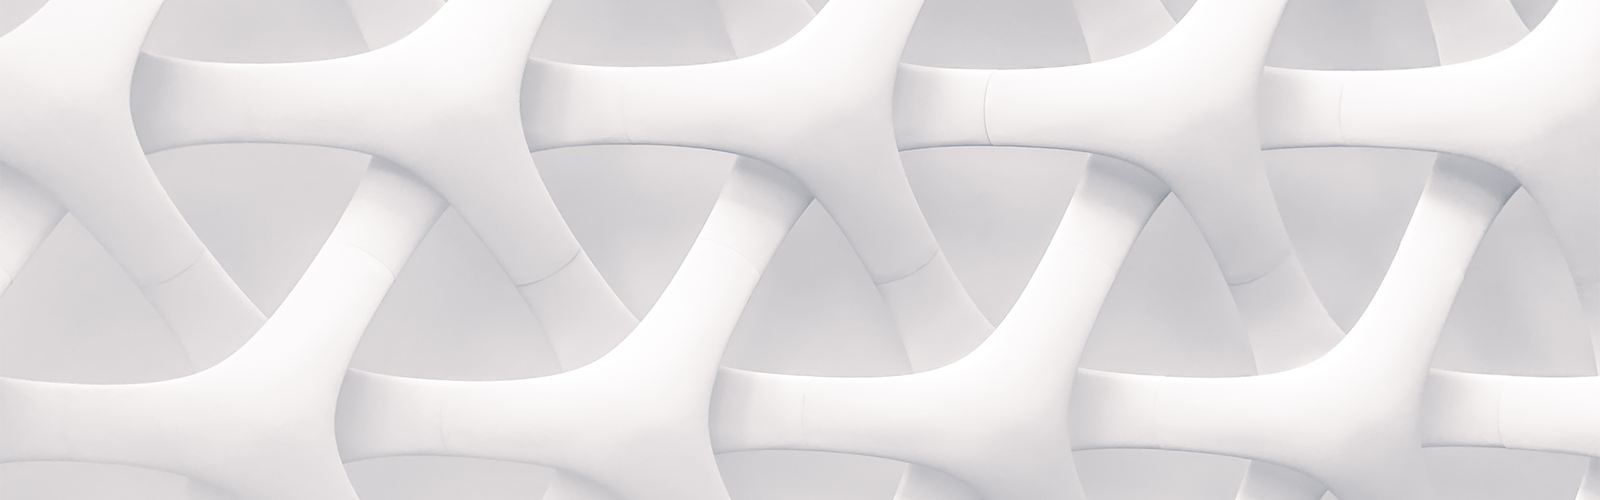 Interlocking shapes create an optical illusion